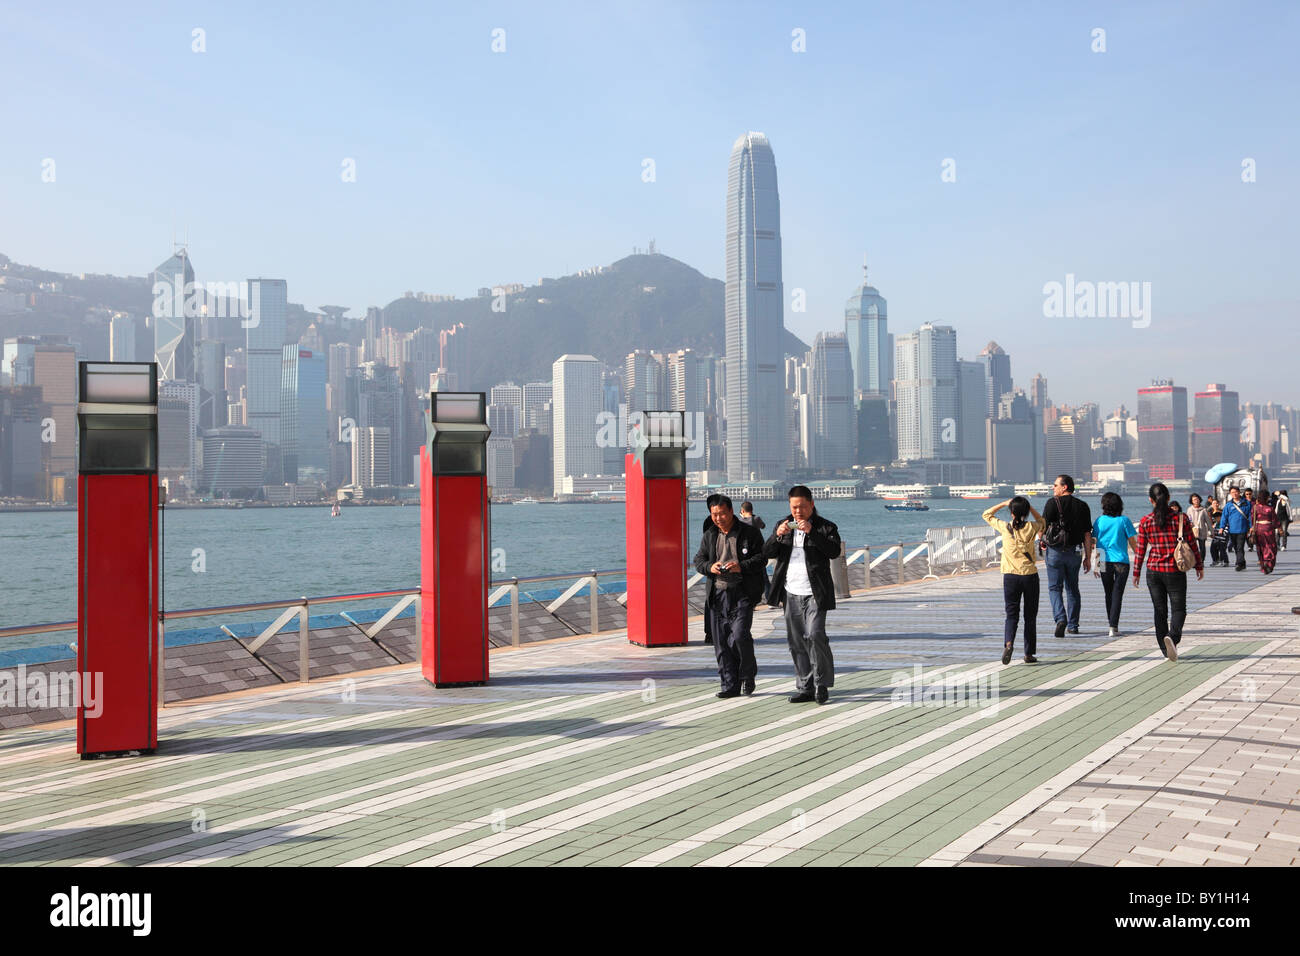 La avenida de las estrellas en Hong Kong. Foto tomada en el 5º de diciembre de 2010 Imagen De Stock